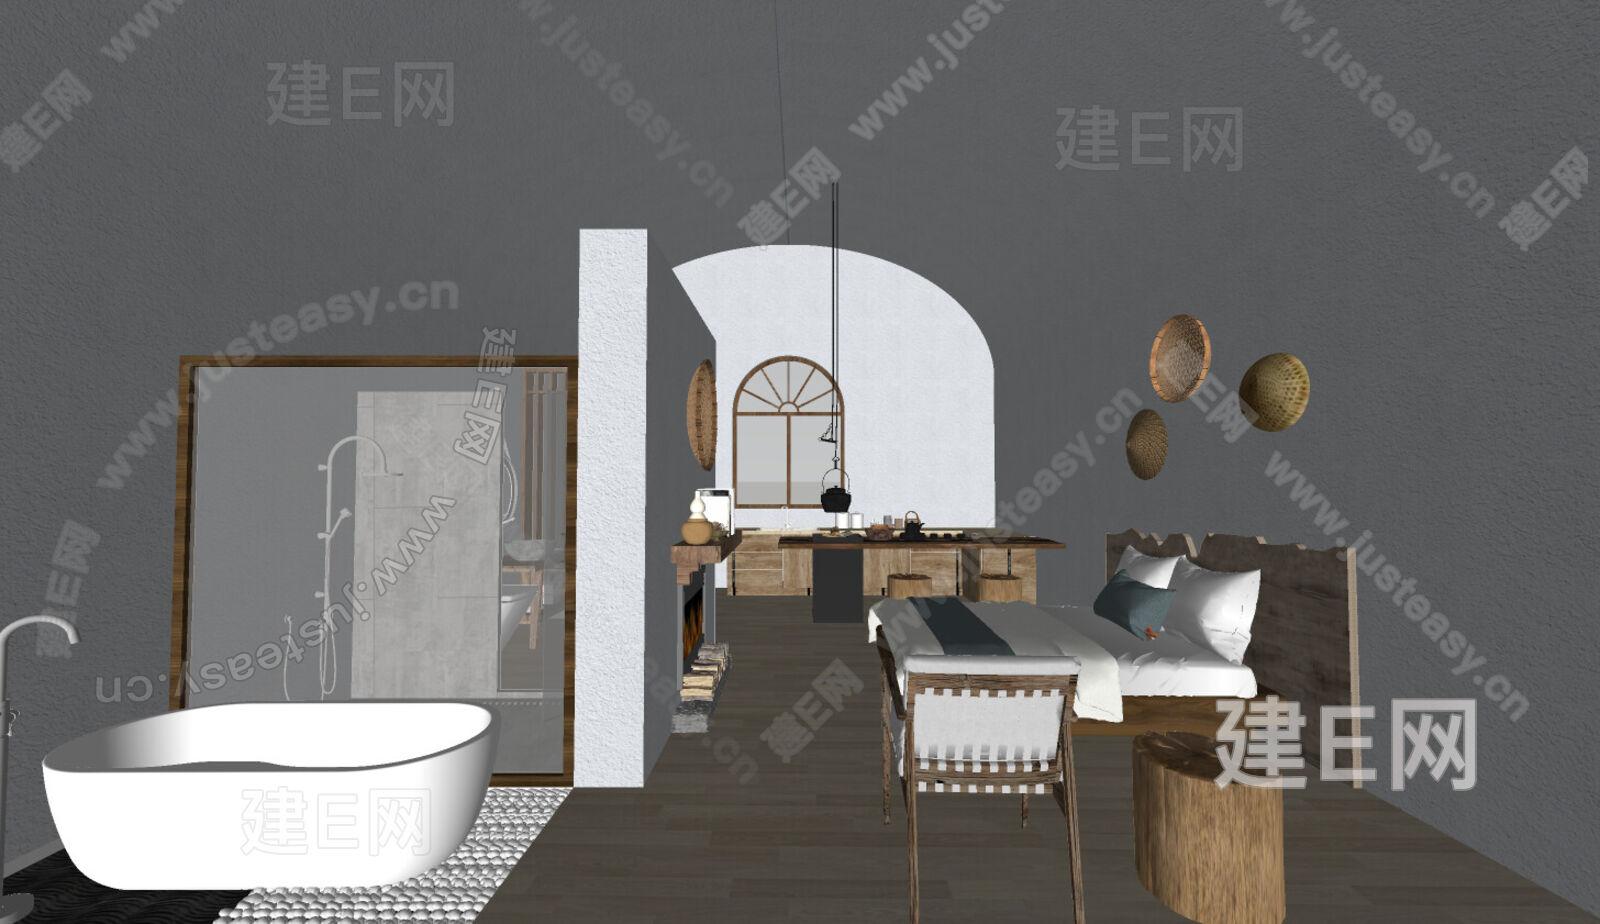 中式卧室sketchup模型